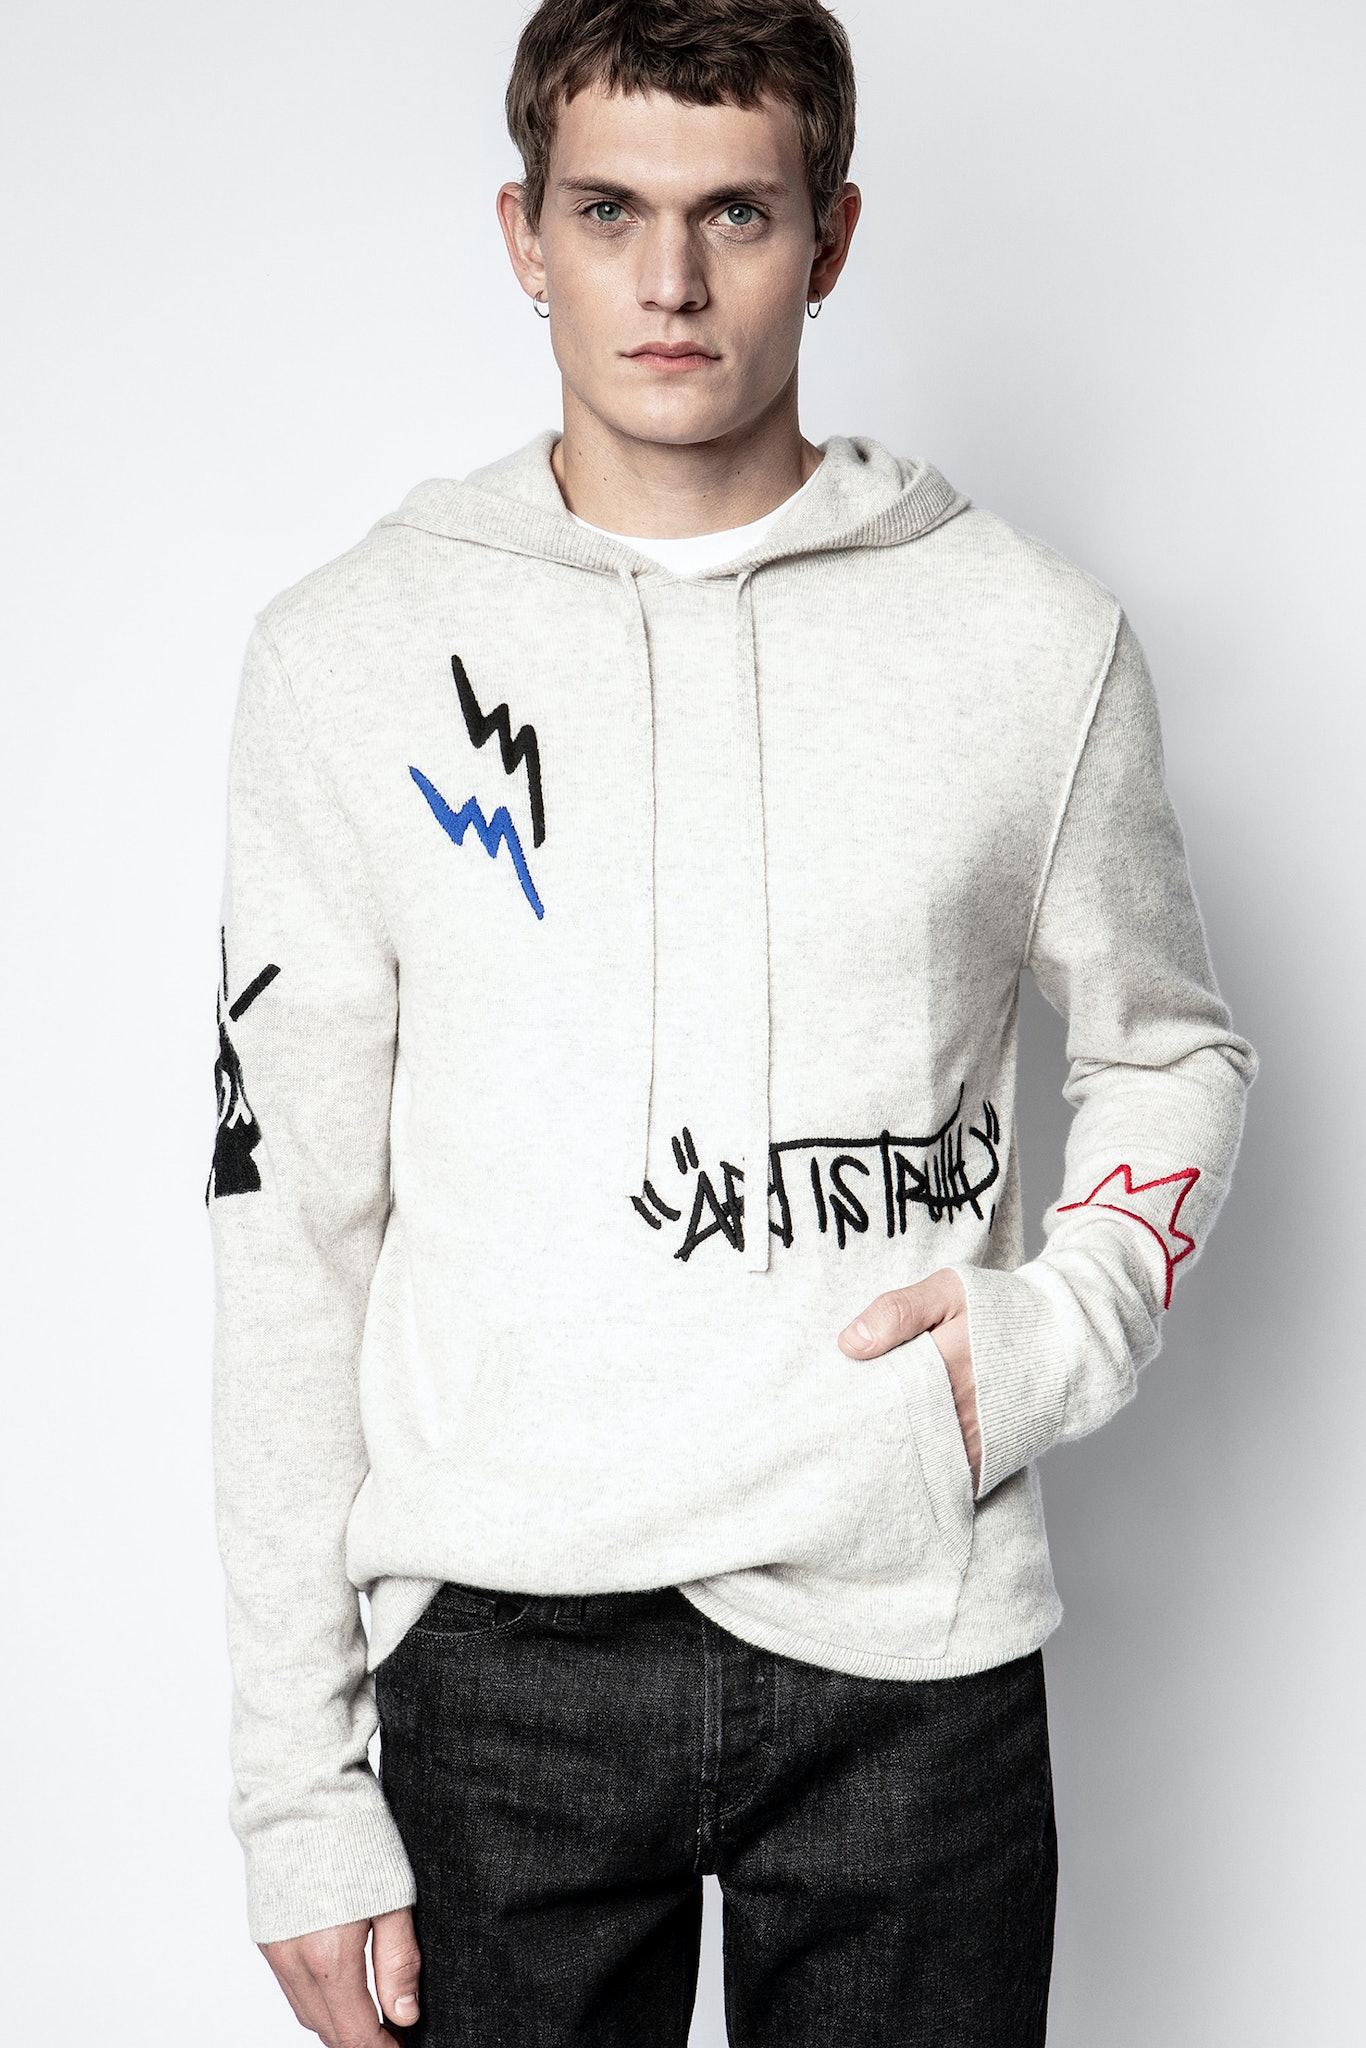 Clay Cashmere Jormi Sweater